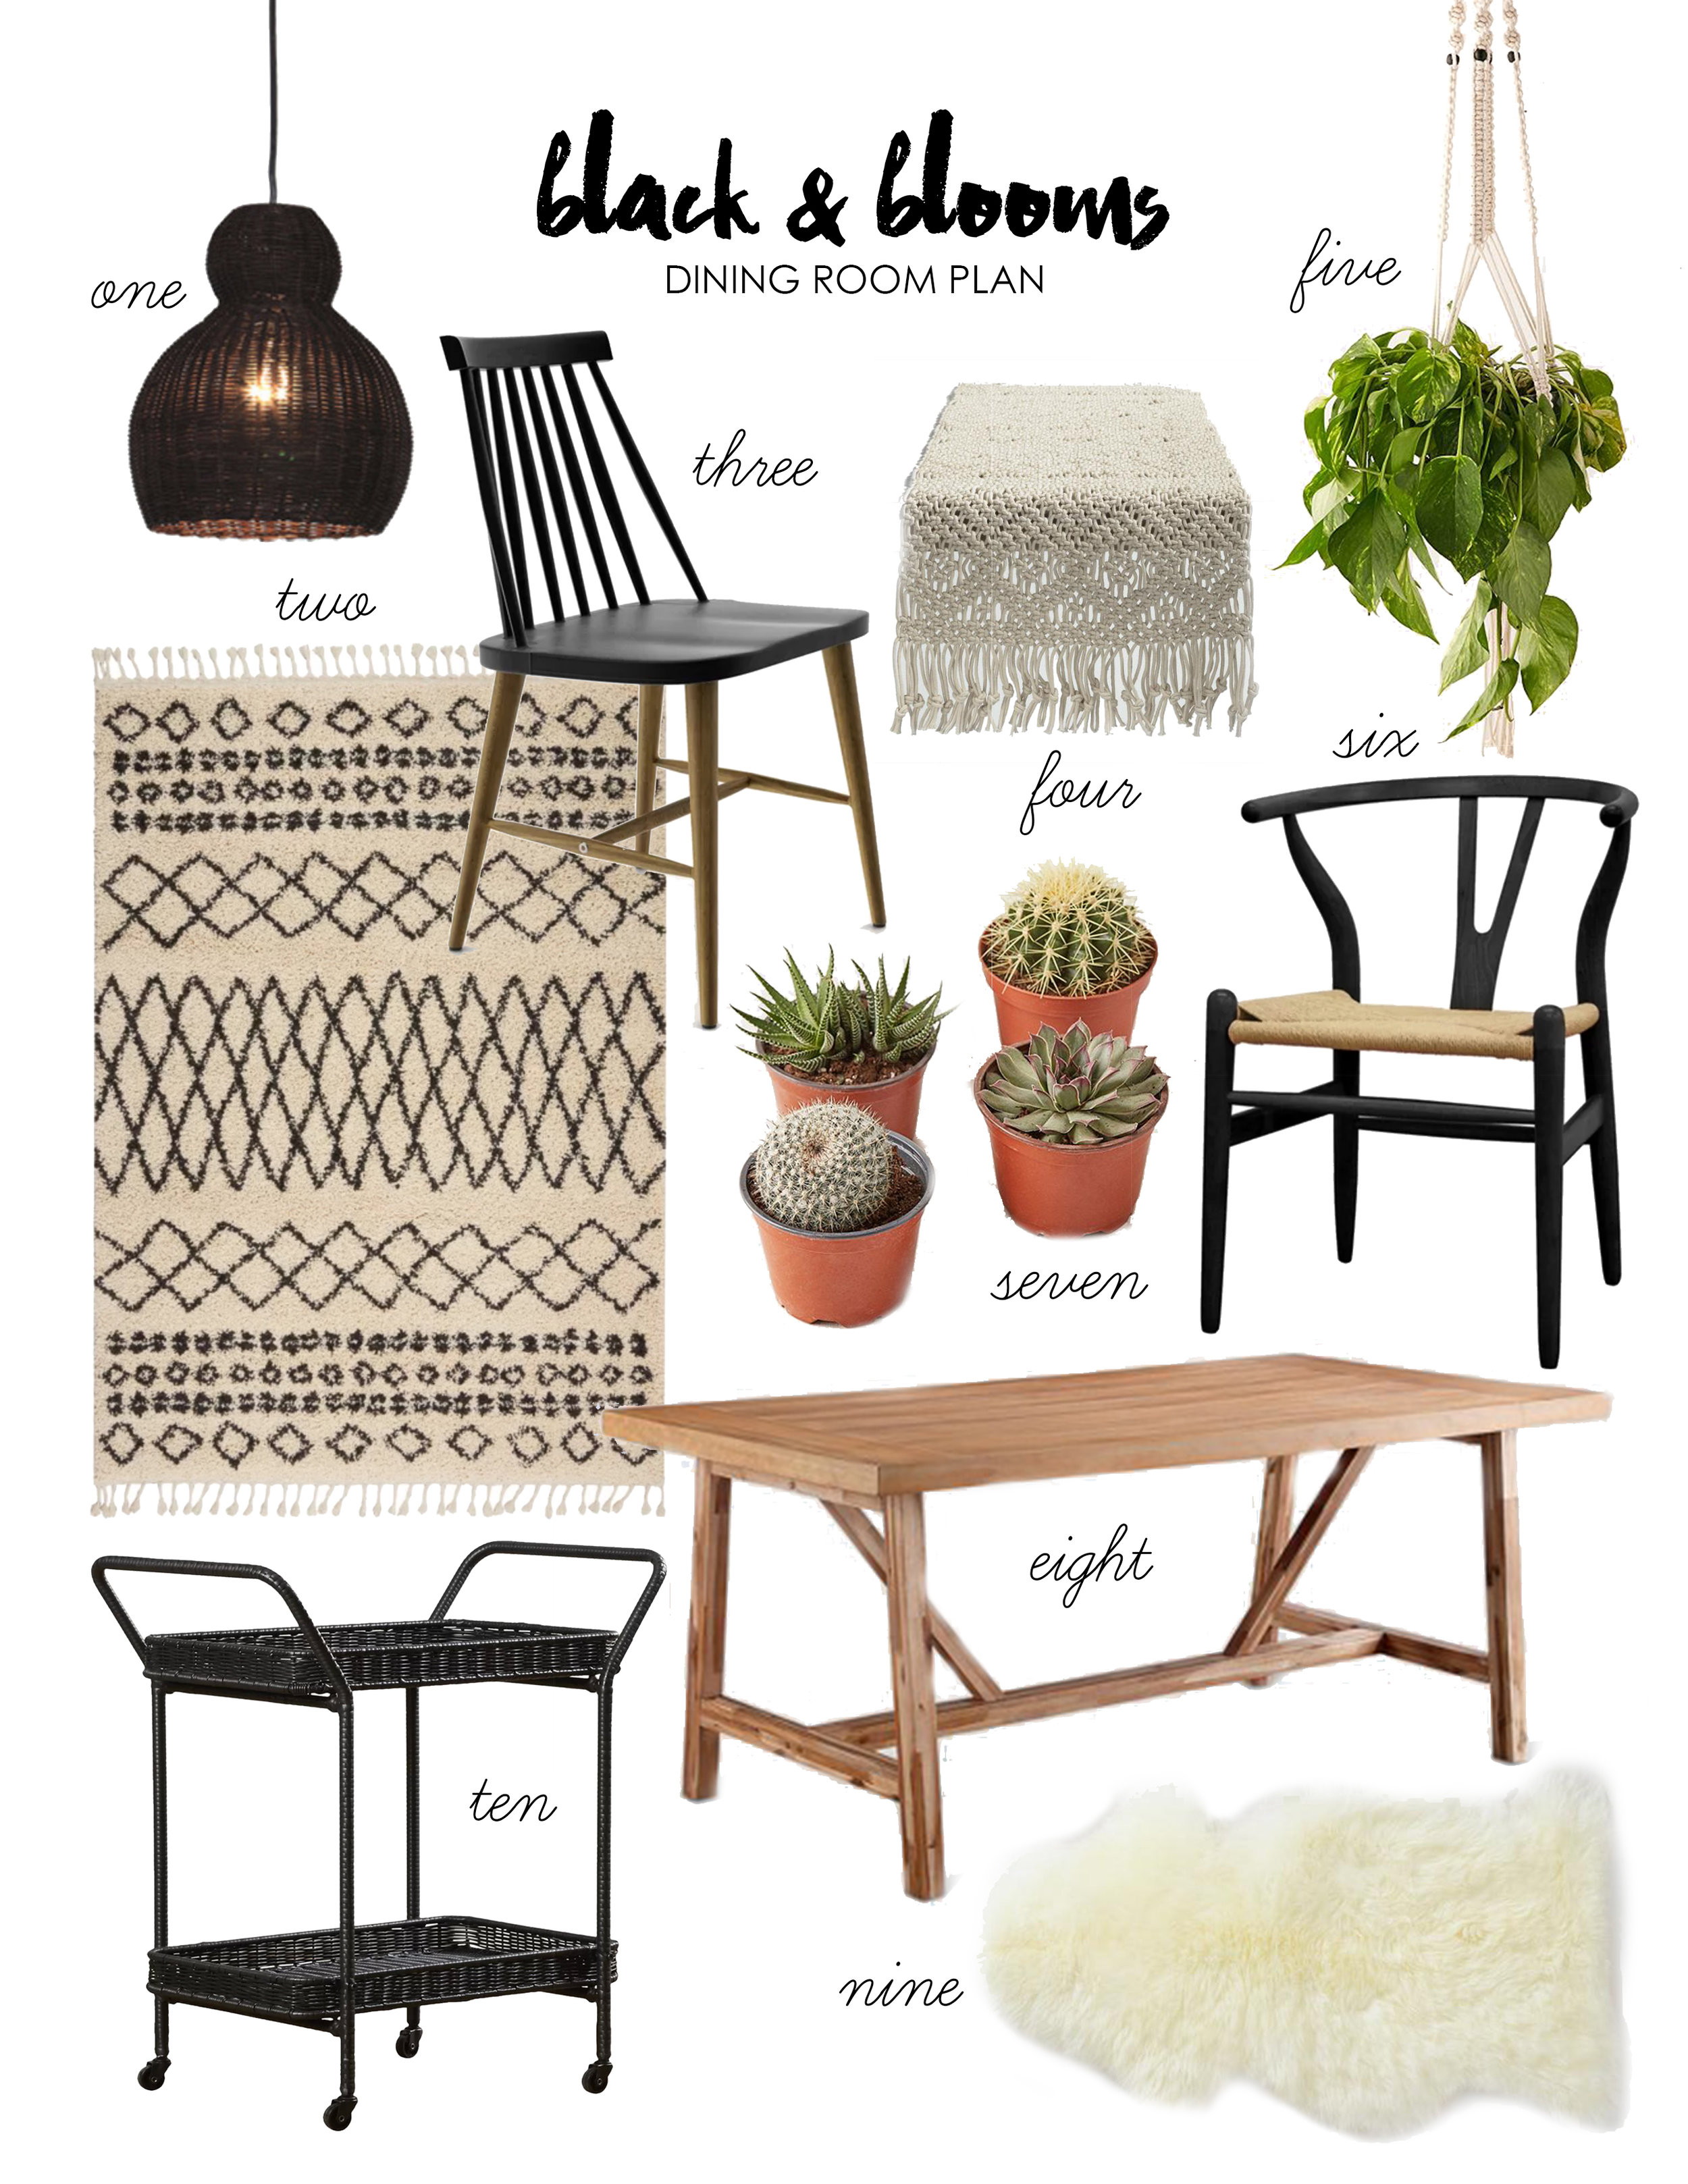 black & blooms dining room plan